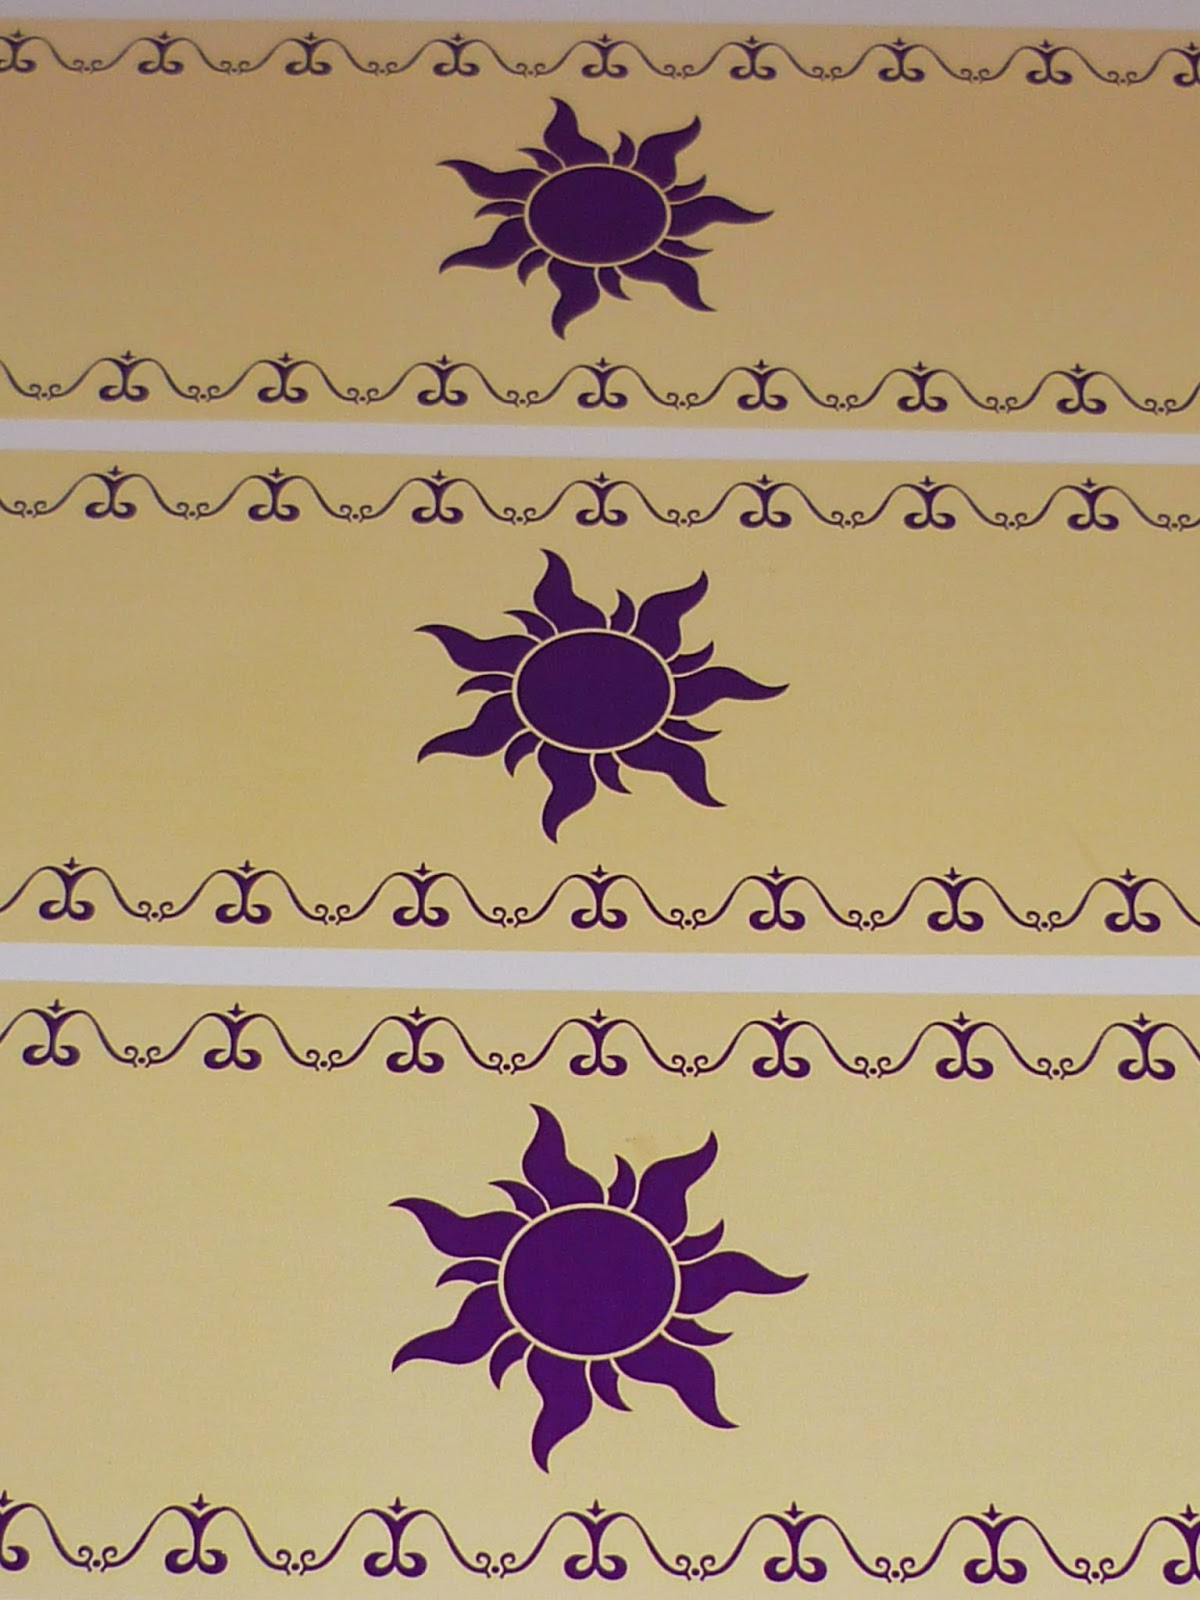 Minimandy. Rapunzel. Tangled. Enredados. Linterna. Luces Flotantes. Sol. Guirnaldas. Papel.